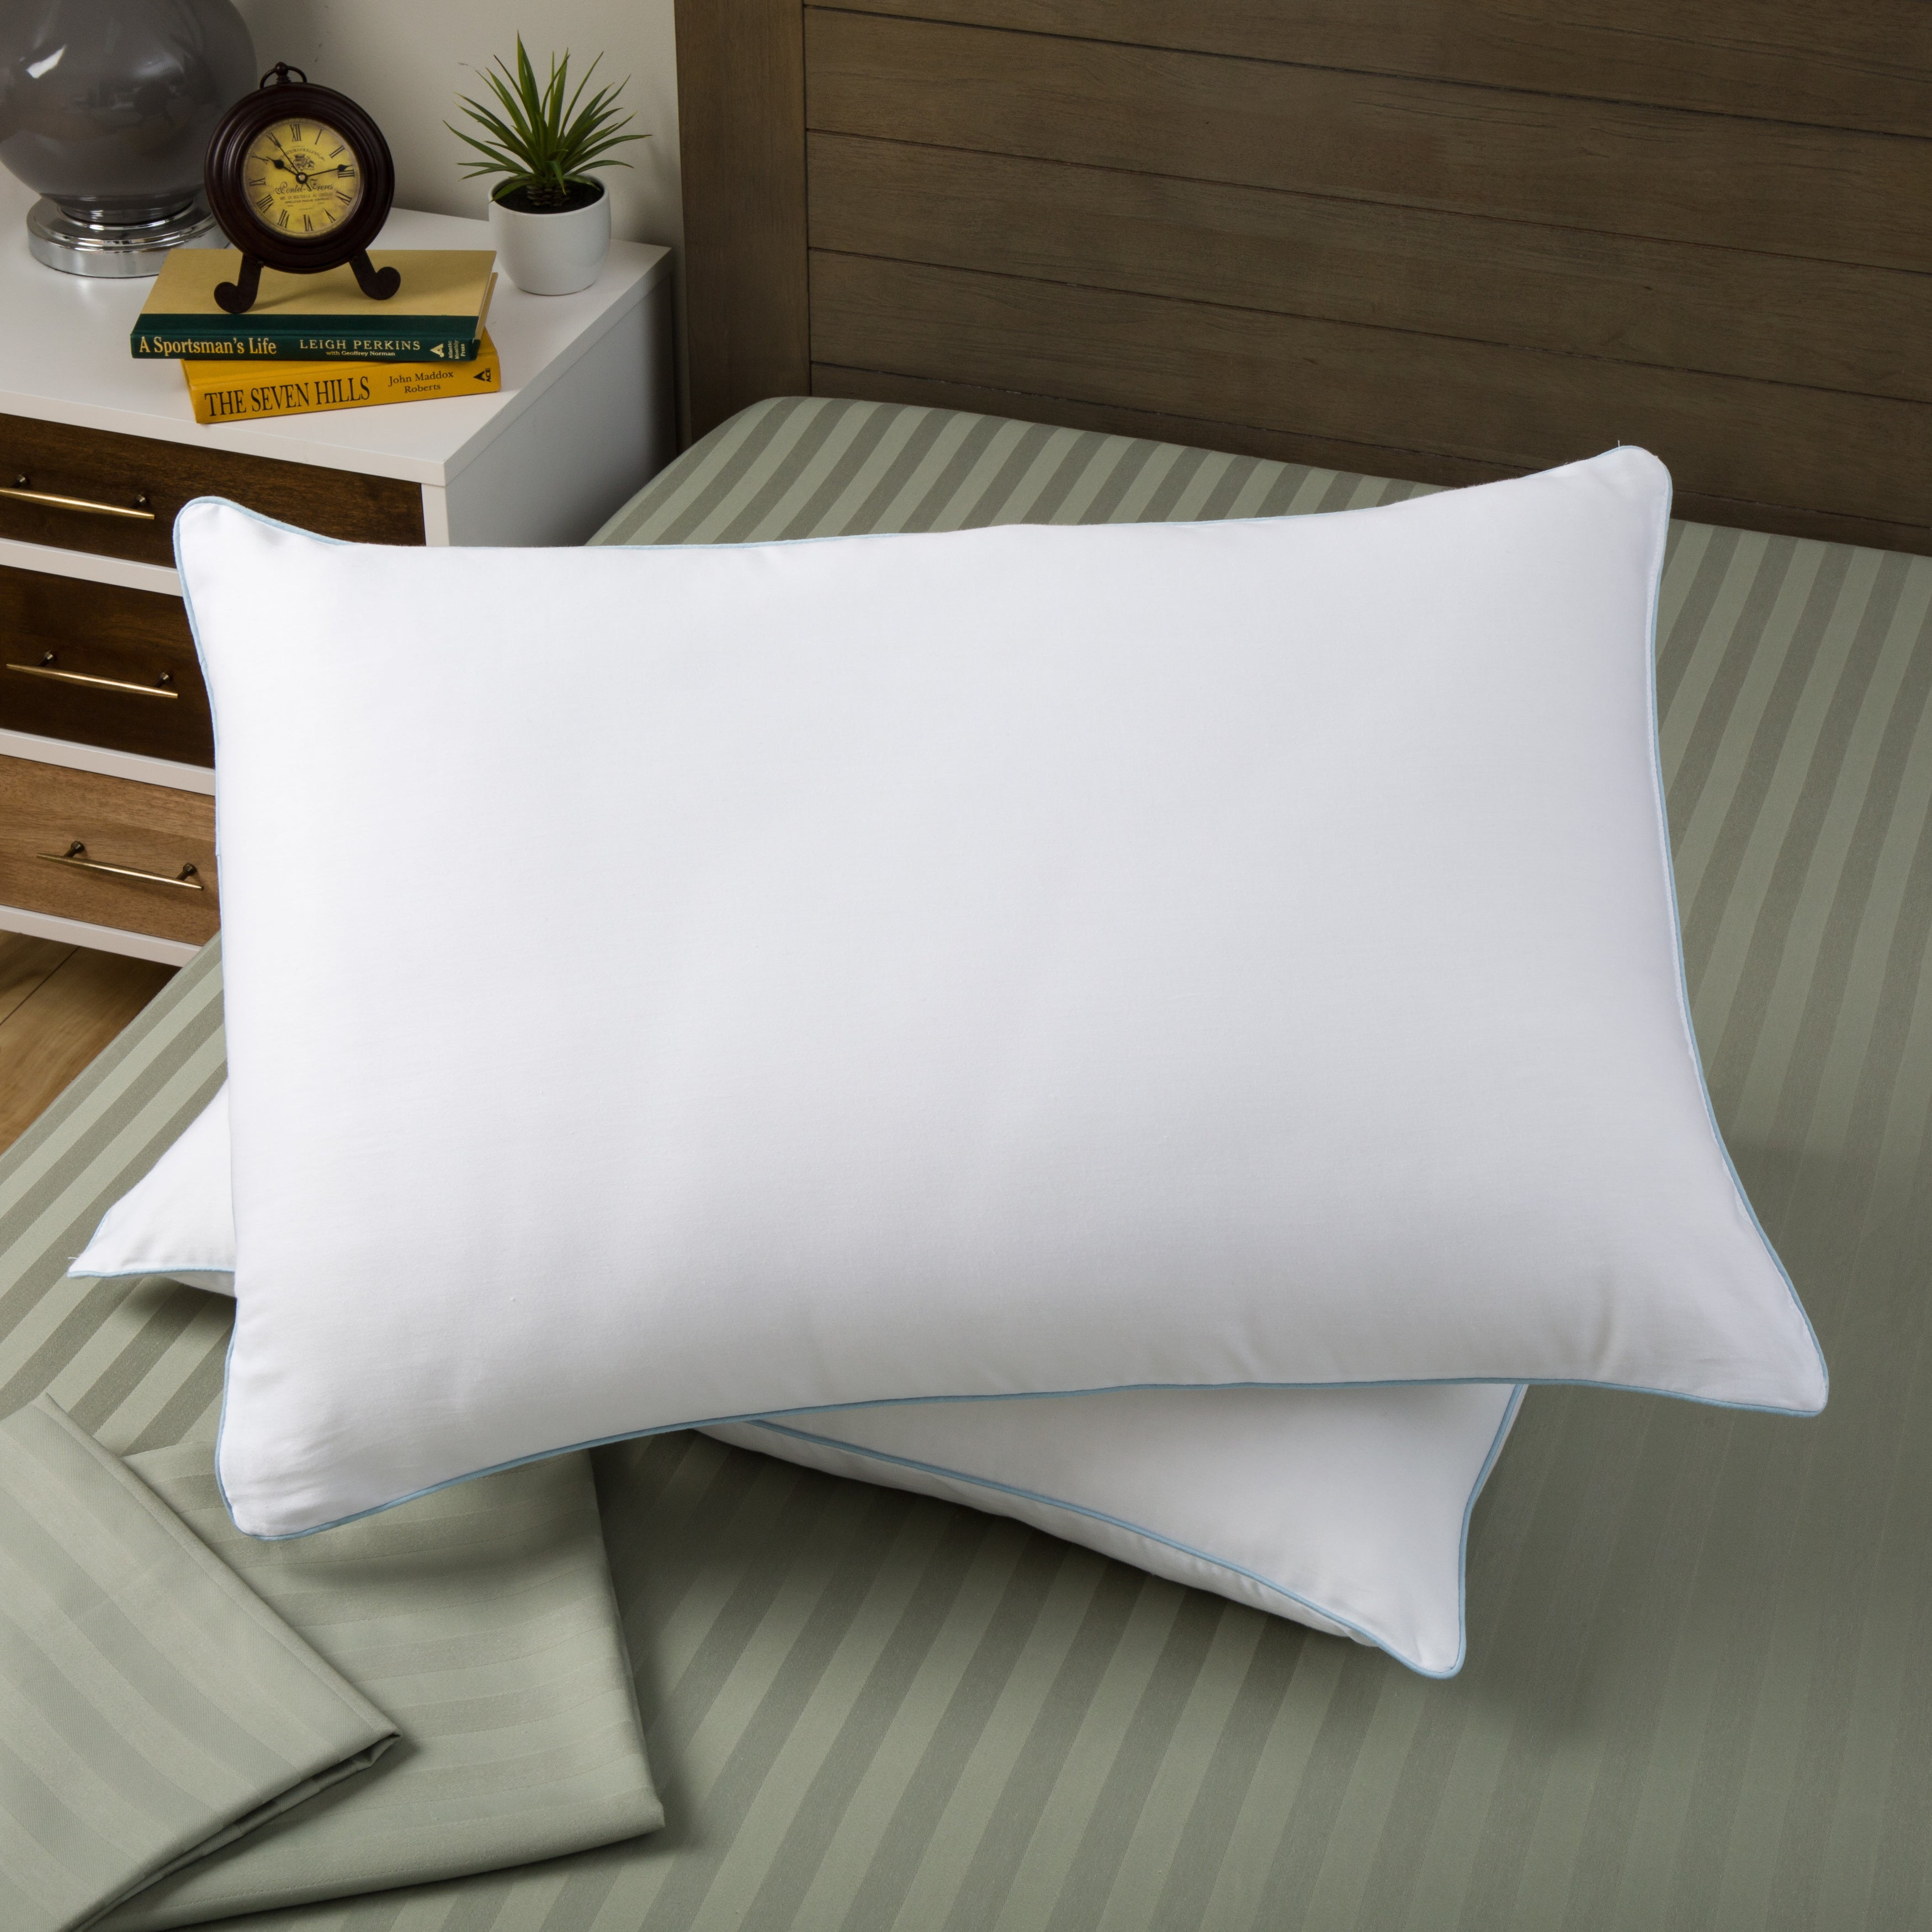 "Bedding Essentials Neckroll Pillow 6/"" X 15/"" Hypoallergenic Poly Fiberfill"